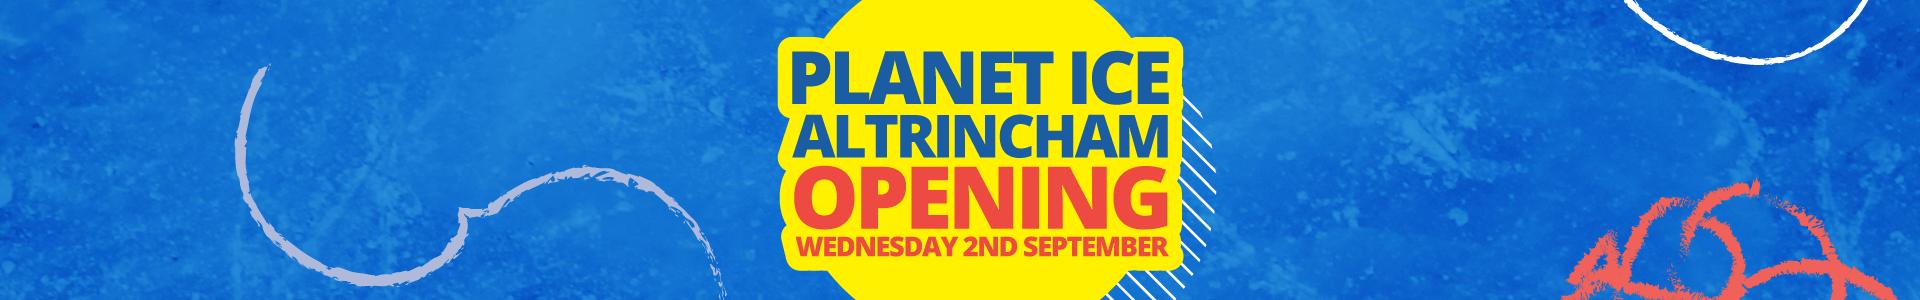 Planet Ice Altrincham